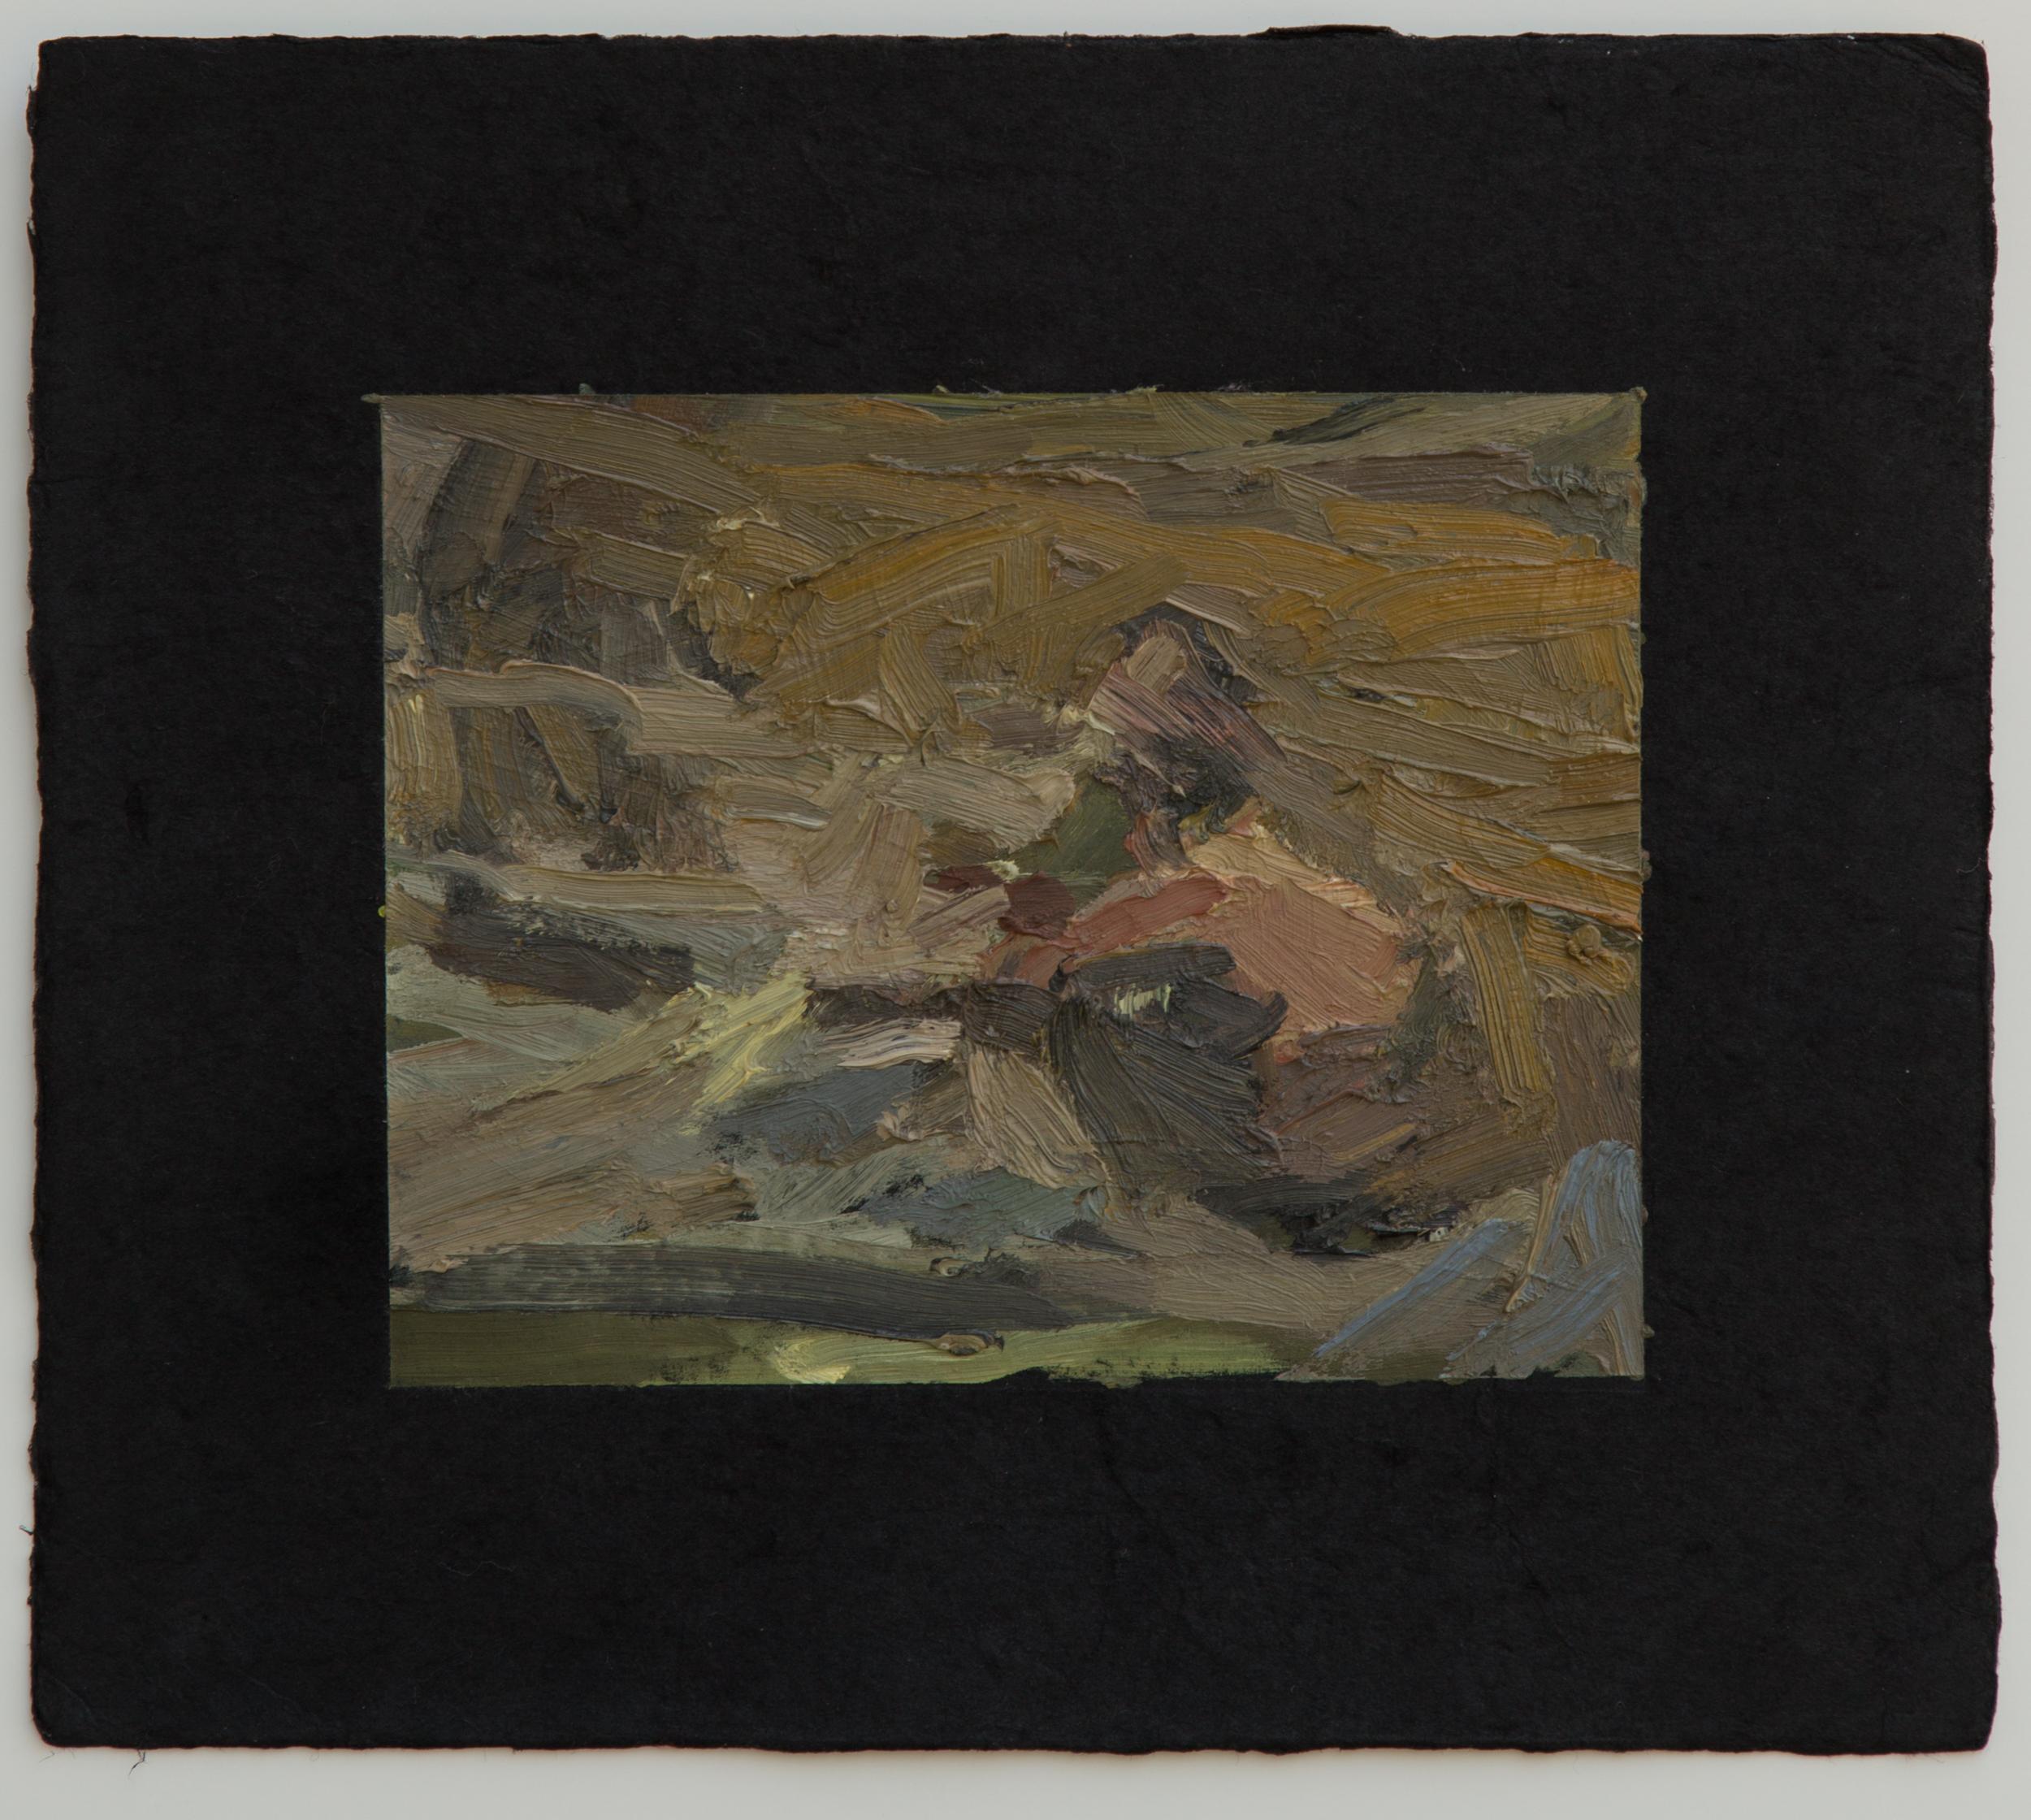 "Campfire study IV, 9 x 10"", 2016"